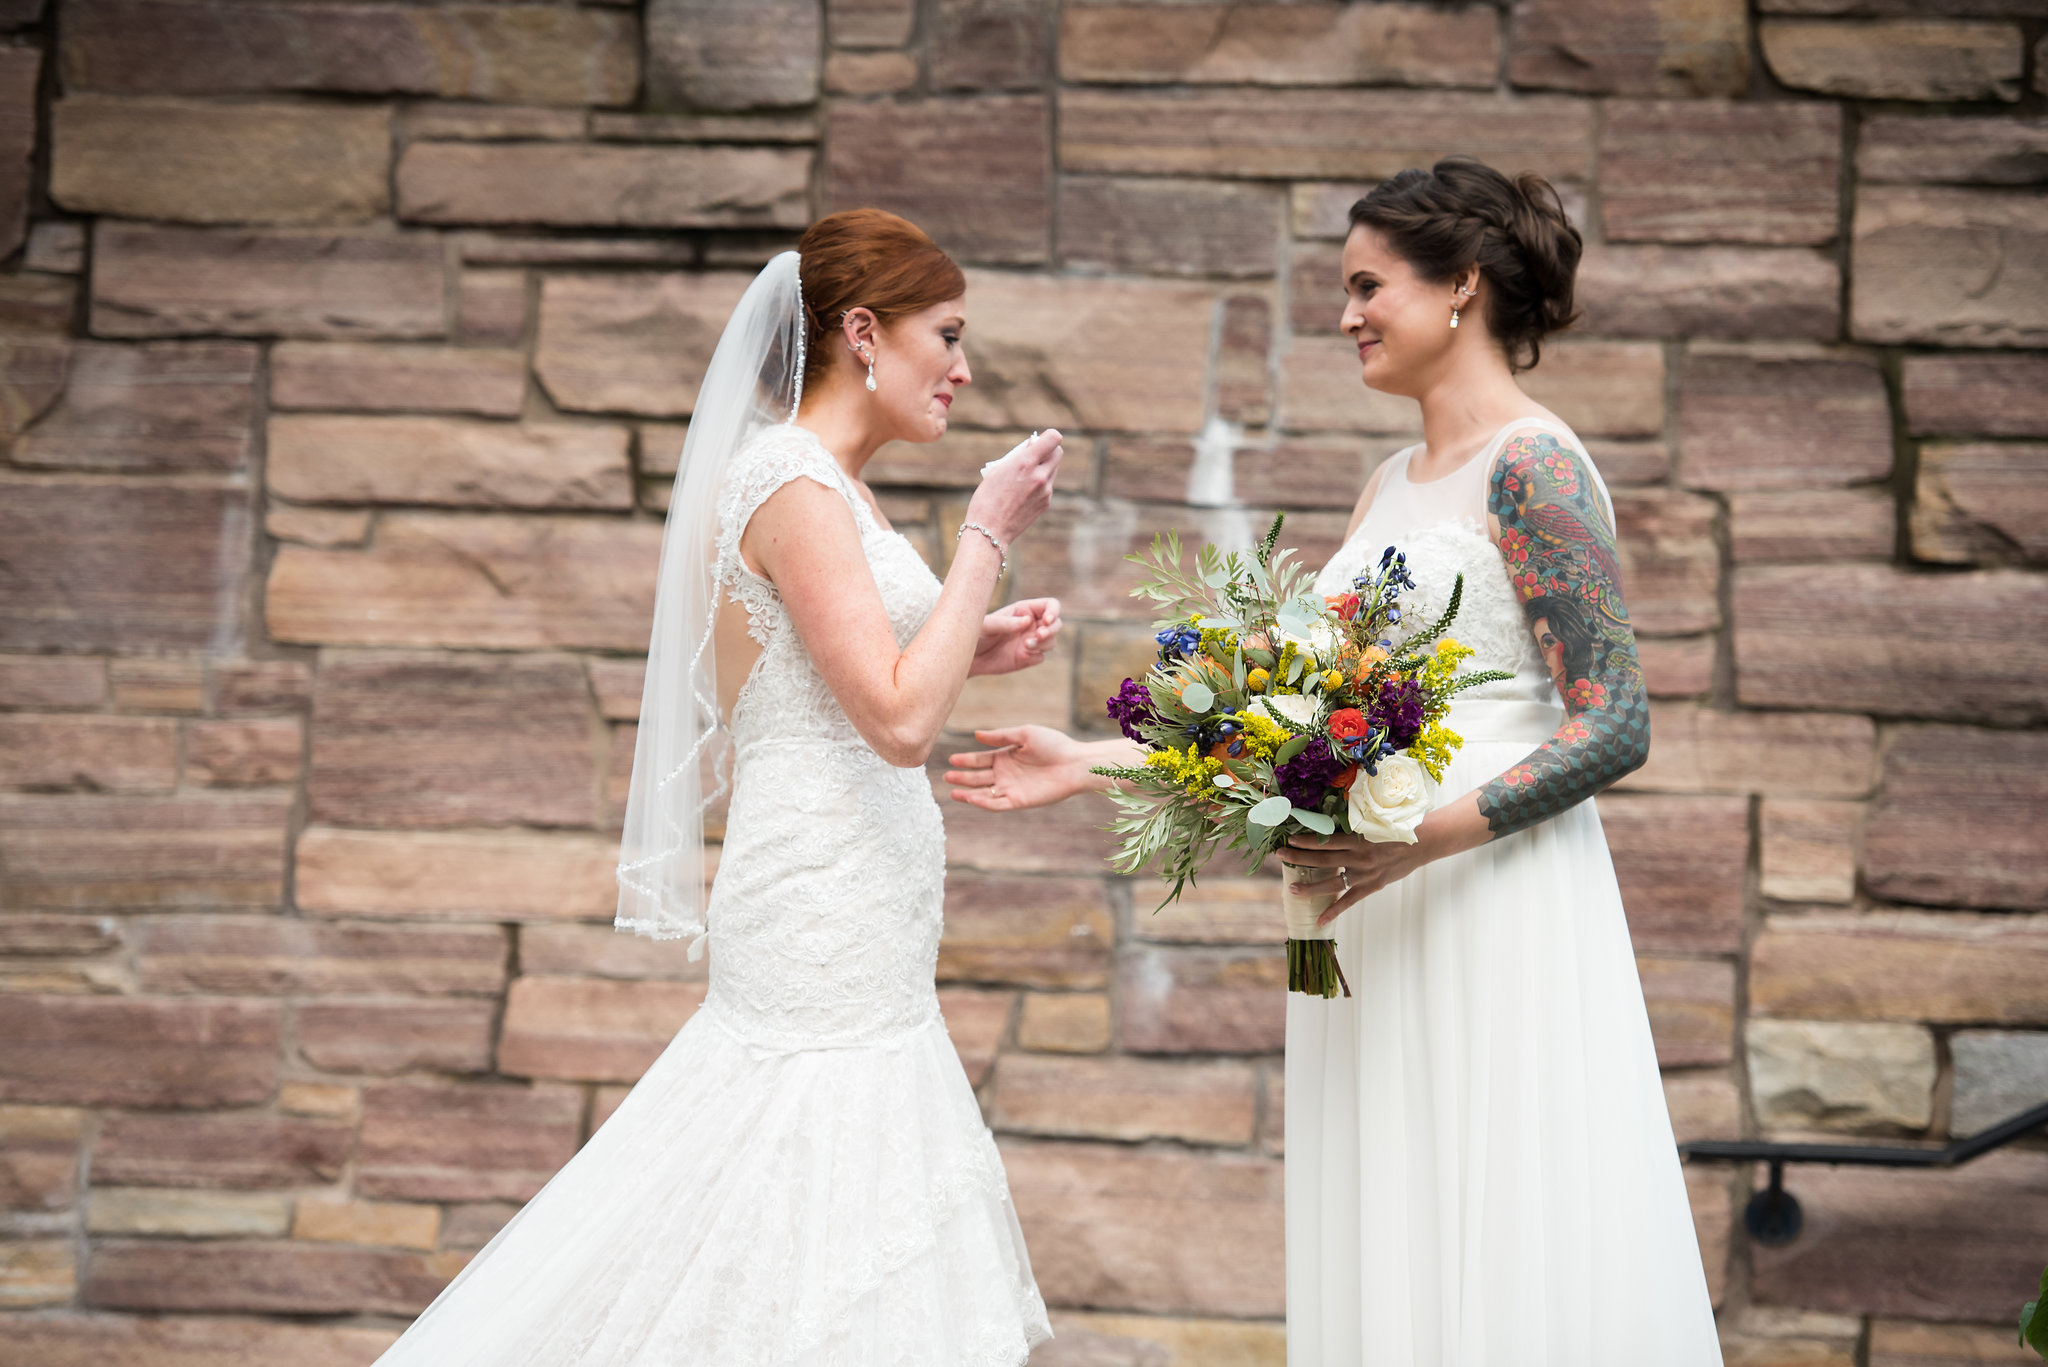 burlington-vermont-wedding-photographer-sarah-annay-photography.jpg2.jpg